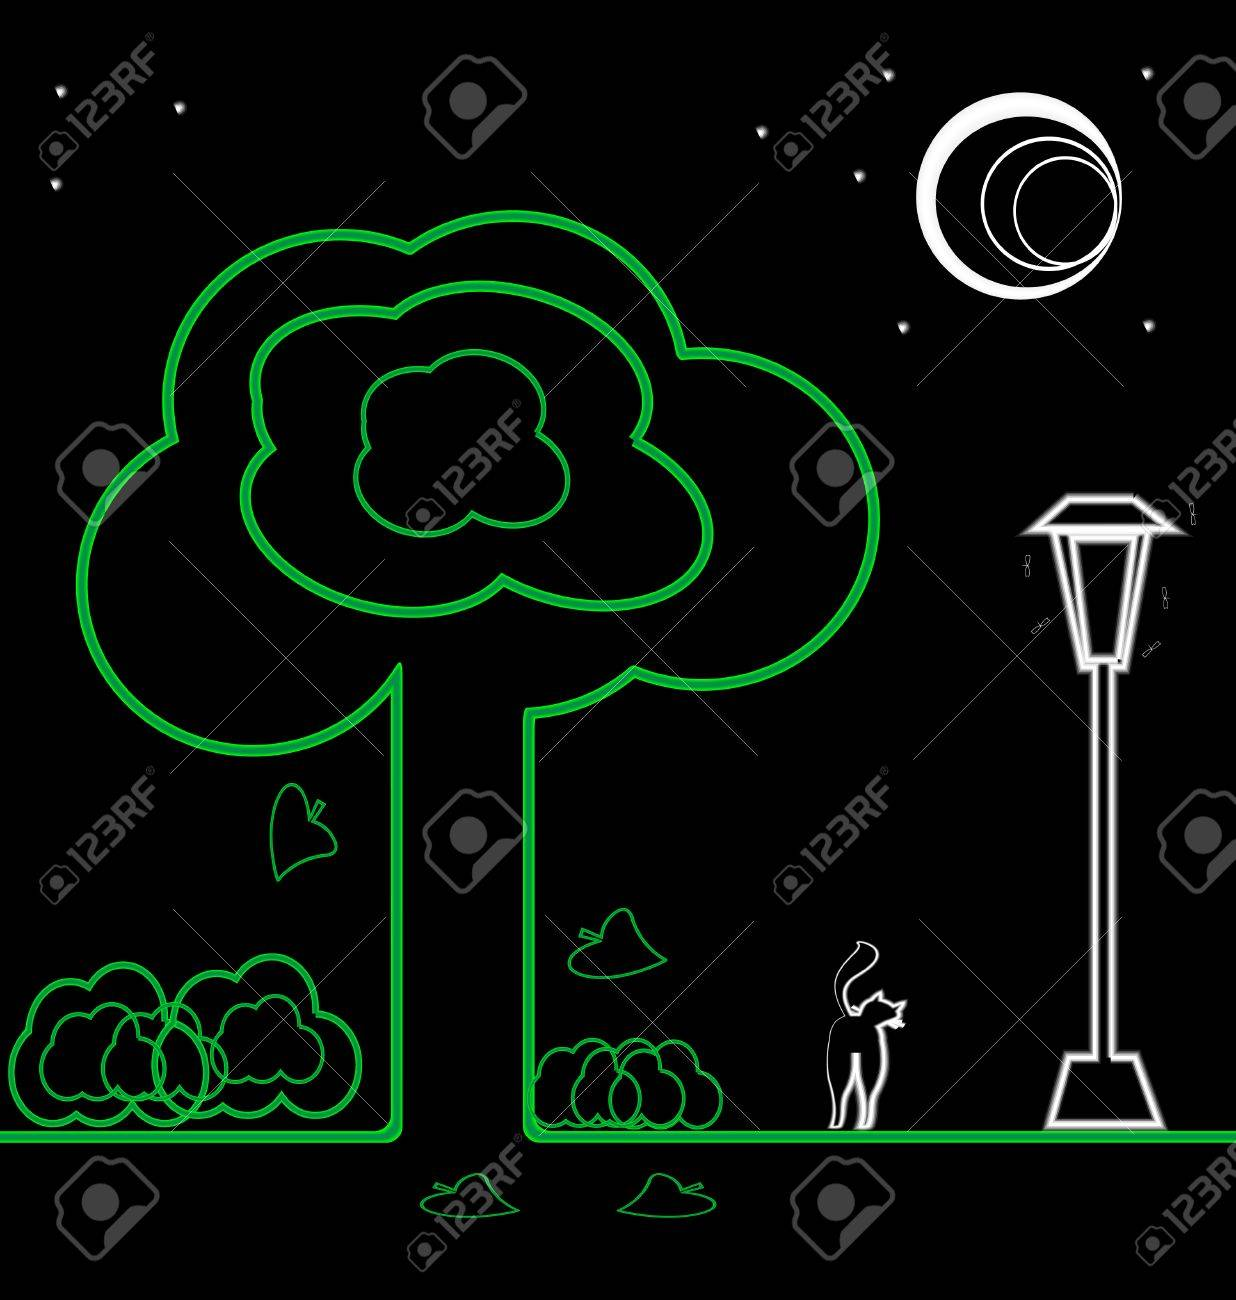 shrub graphic symbols diagram cotton plant anatomy on black night landscape the moon stars trees shrubs lights